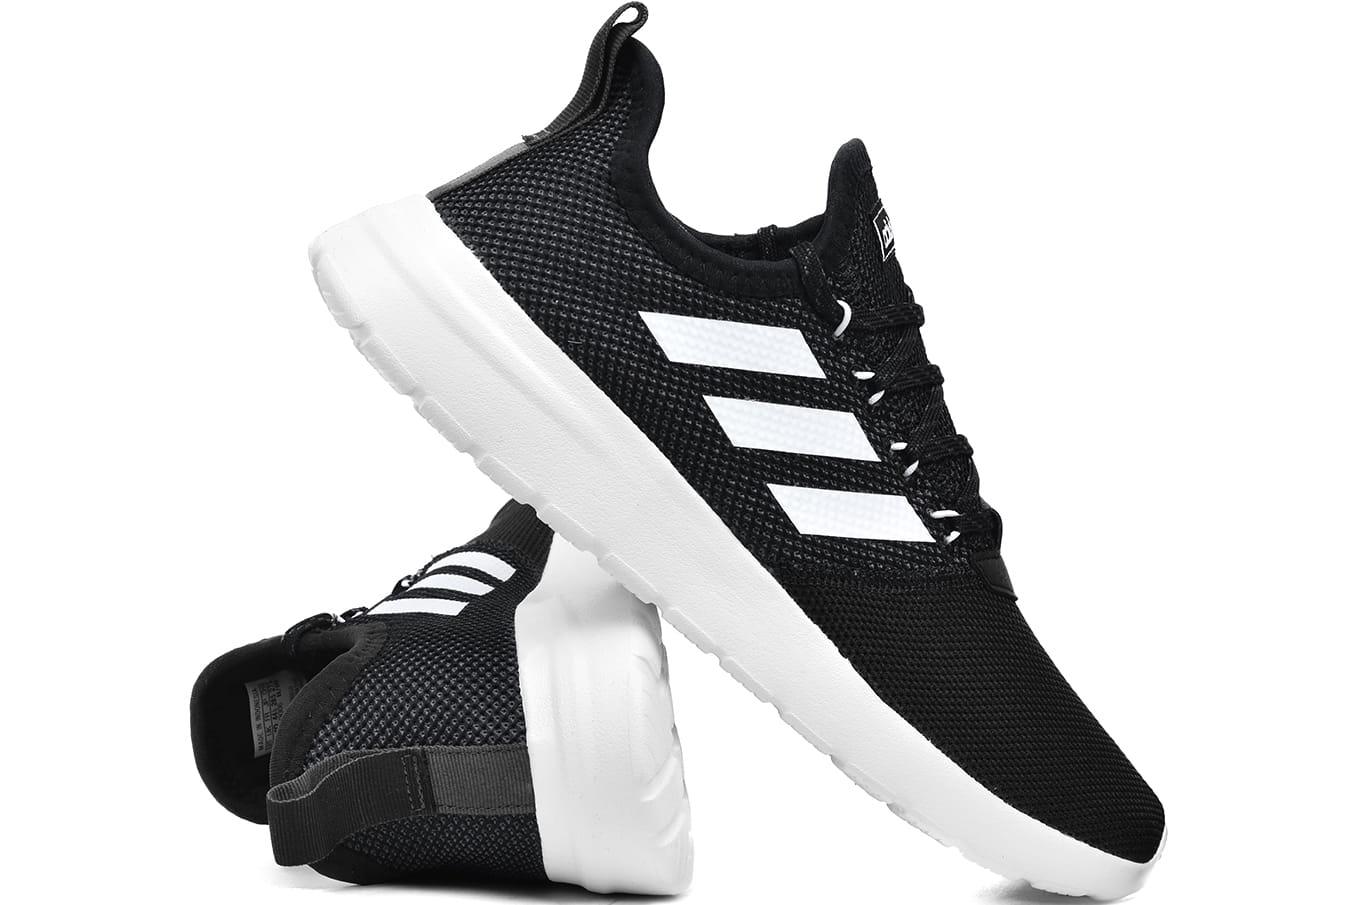 Sklep: buty adidas originals racer lite męskie sportowe